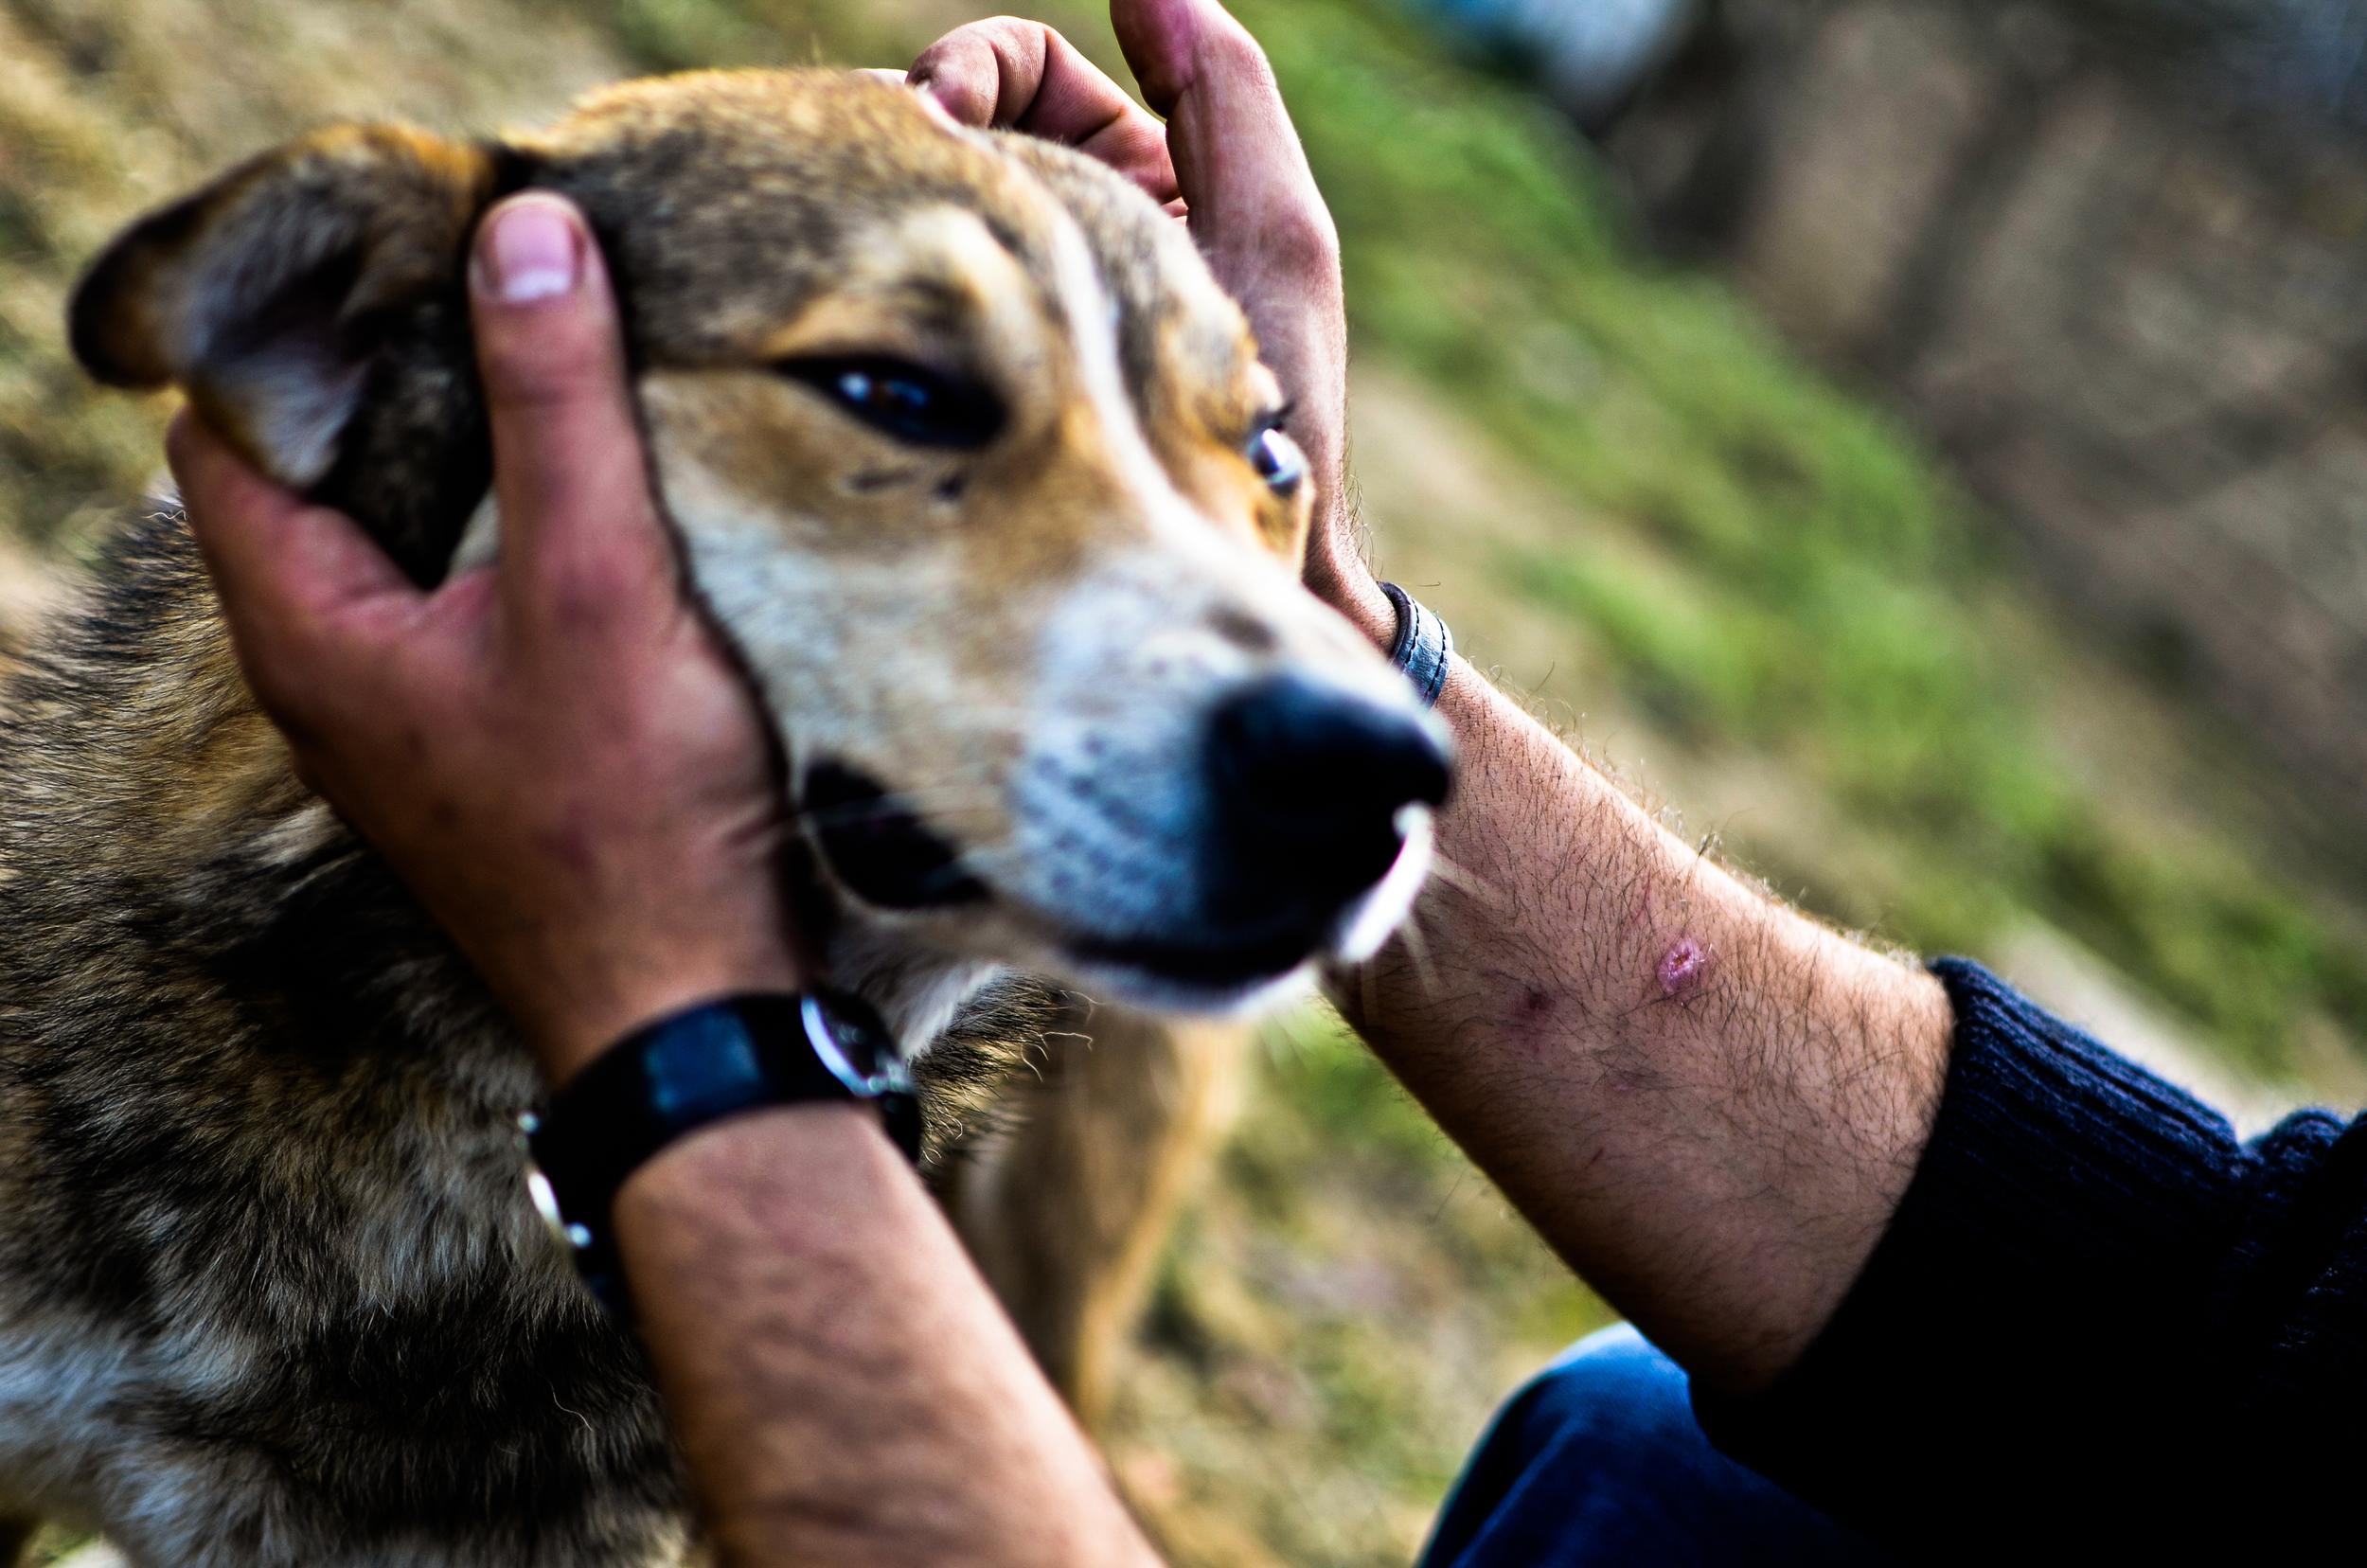 Saving Stray Animals with Fb